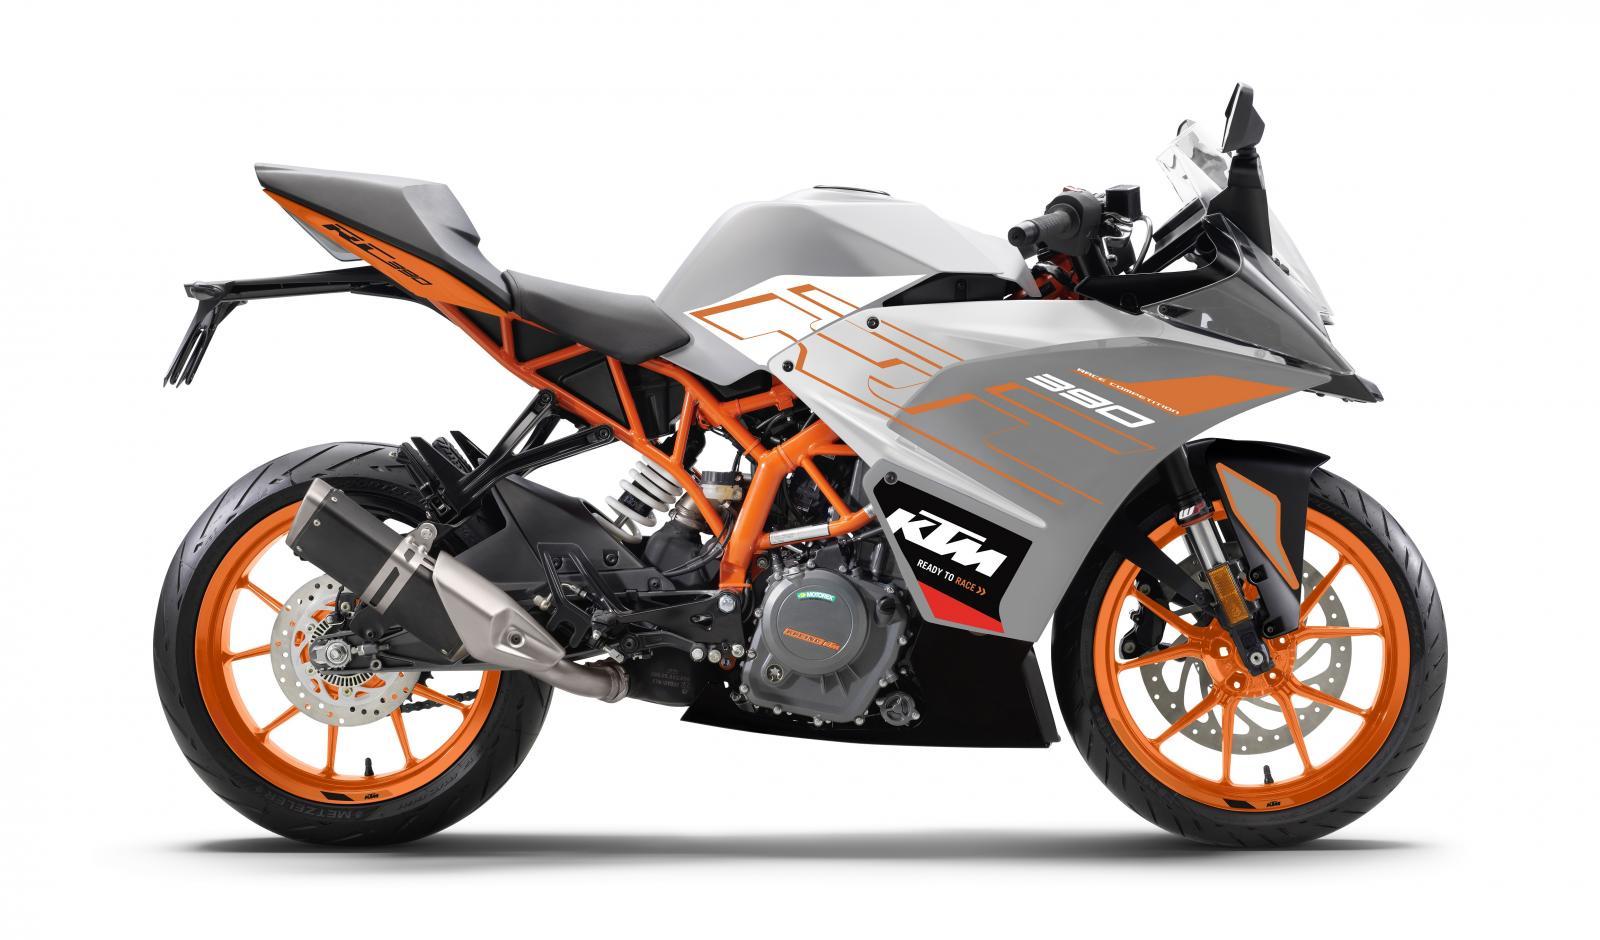 Motorrad KTM RC 390 , Baujahr: 2015, 2 km , Preis: 4.990